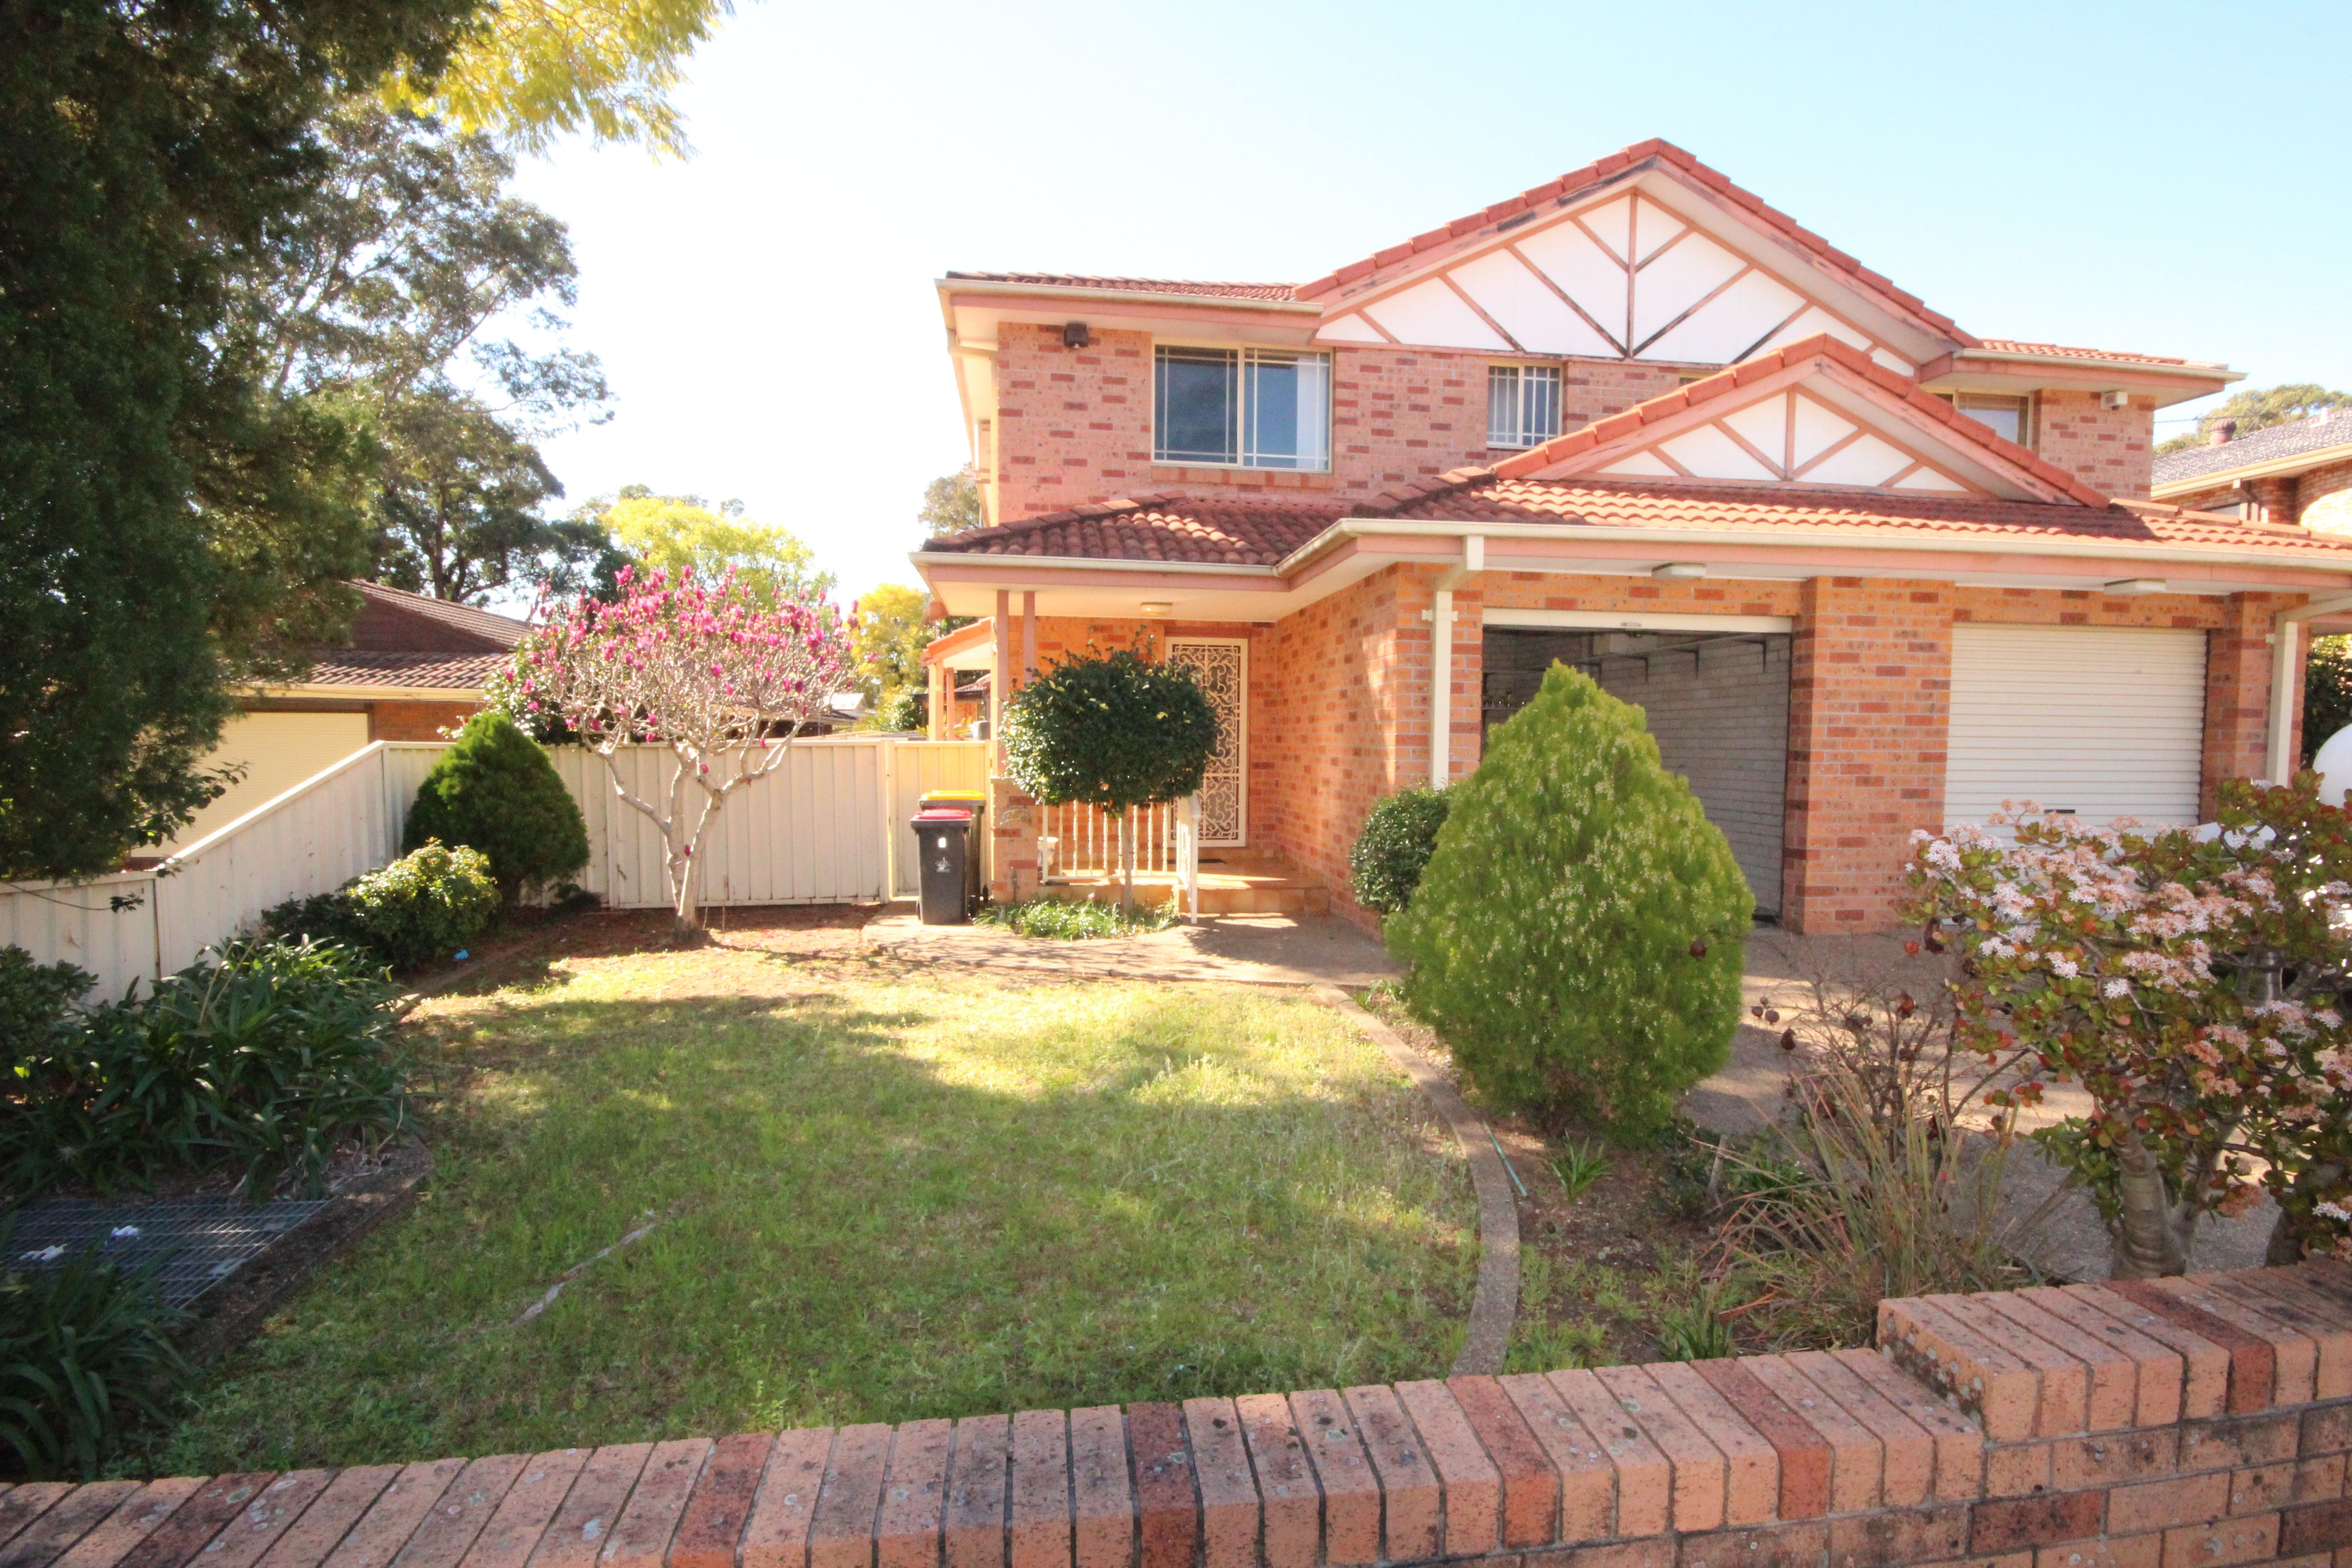 2/112-114 Dutton Street, Yagoona NSW 2199